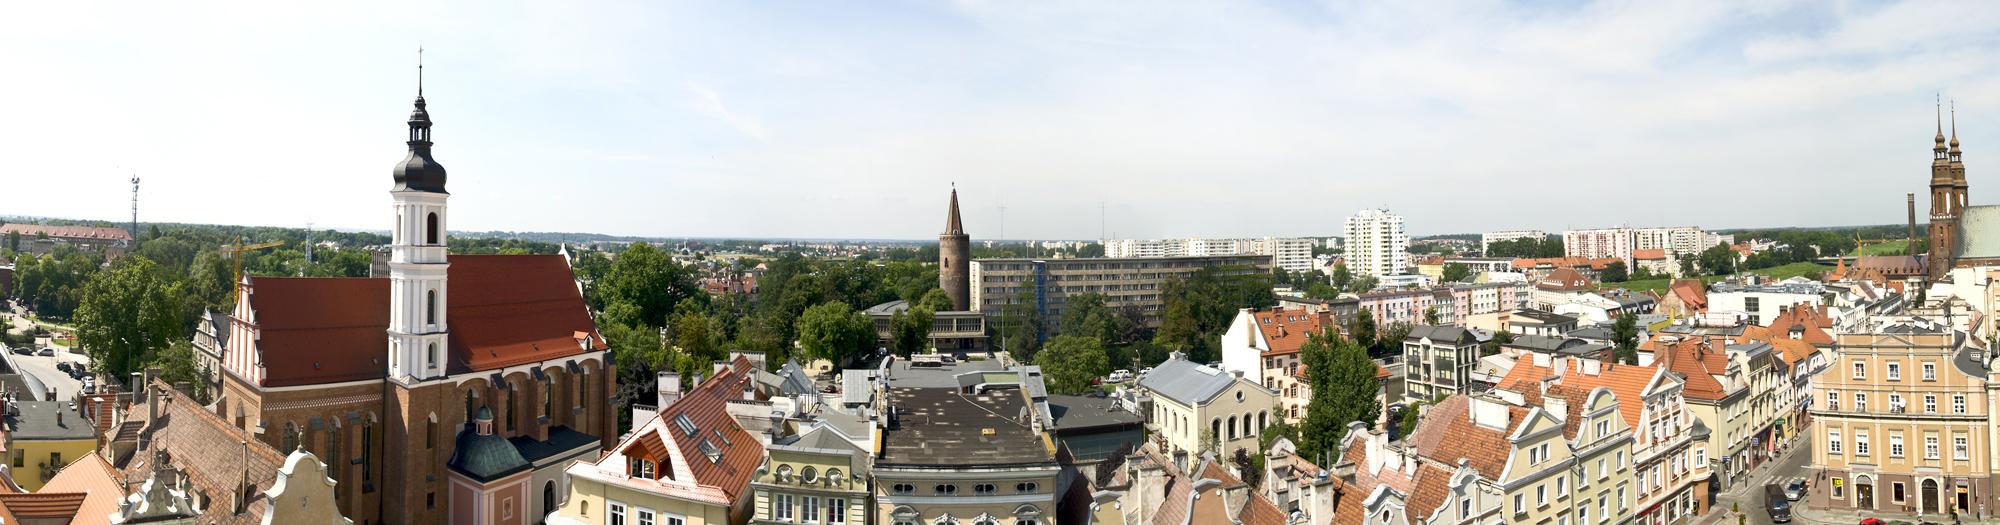 opole-panorama